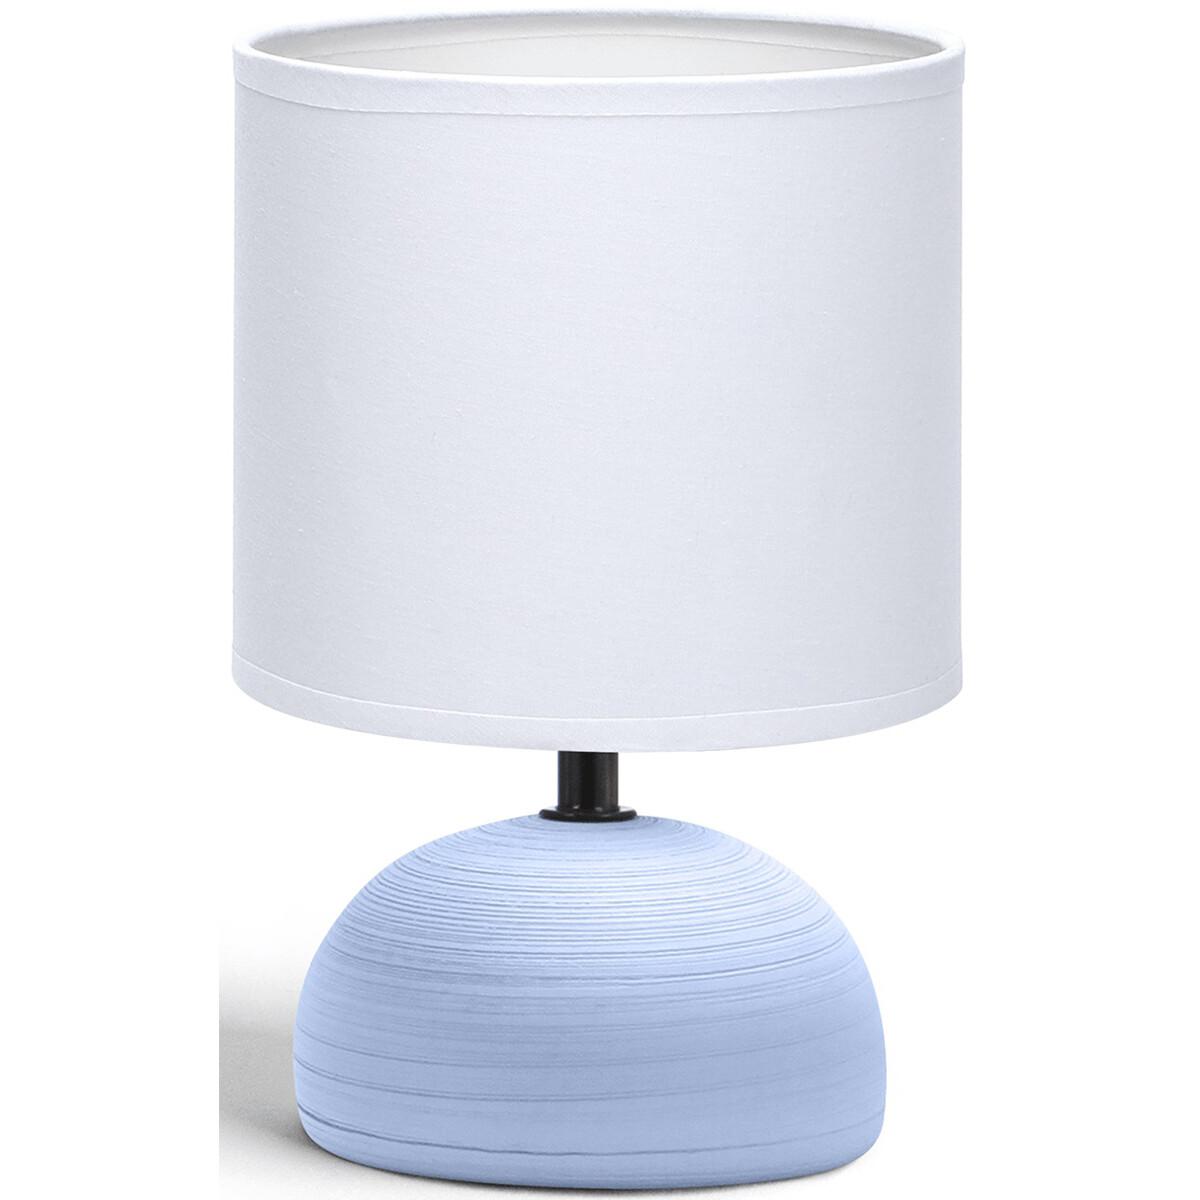 LED Tafellamp - Tafelverlichting - Aigi Conton 2 - E14 Fitting - Rond - Mat Blauw - Keramiek